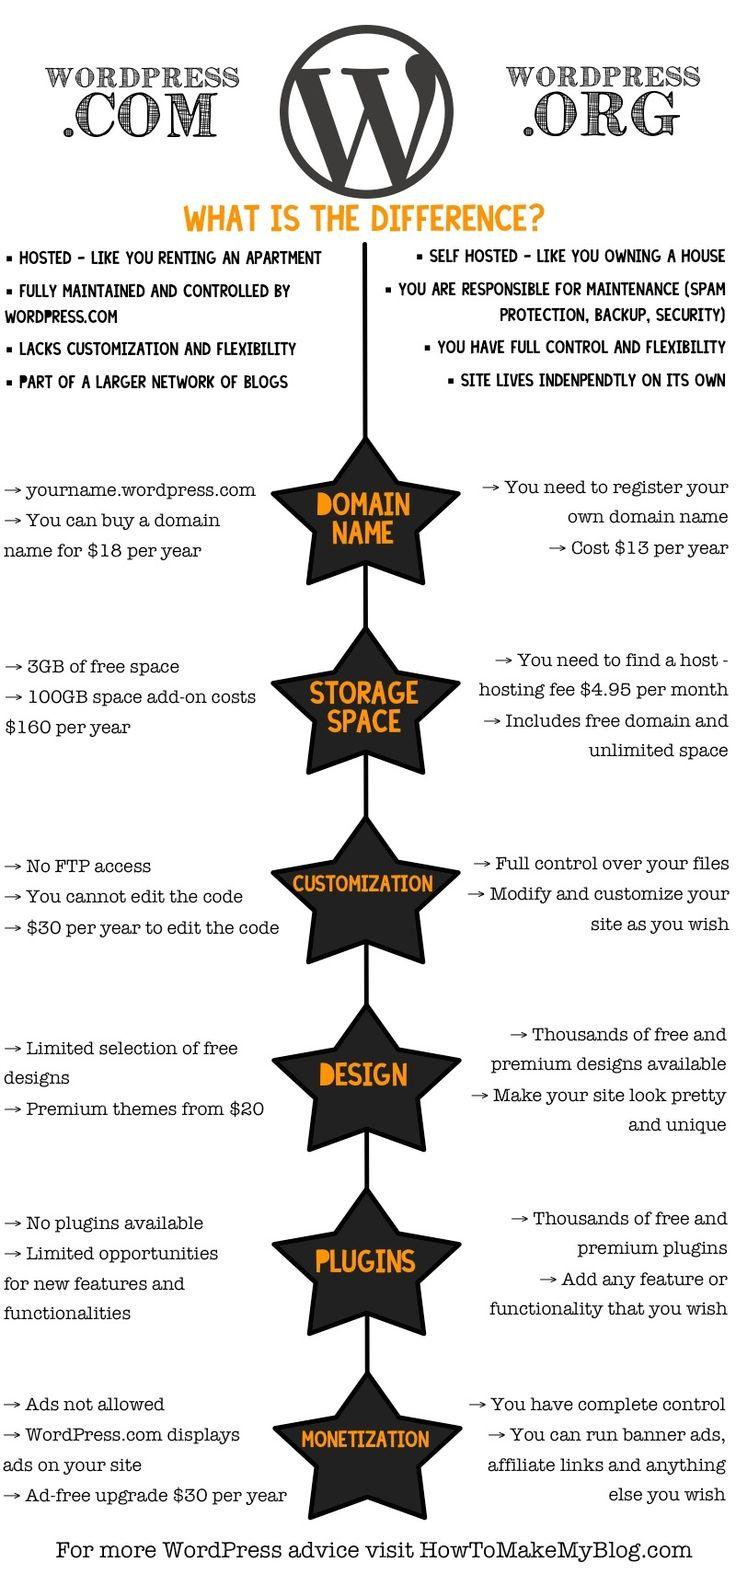 #amWriting WordPress.com Vs WordPress.org Comparison: Which Should I Use? via @angela4design